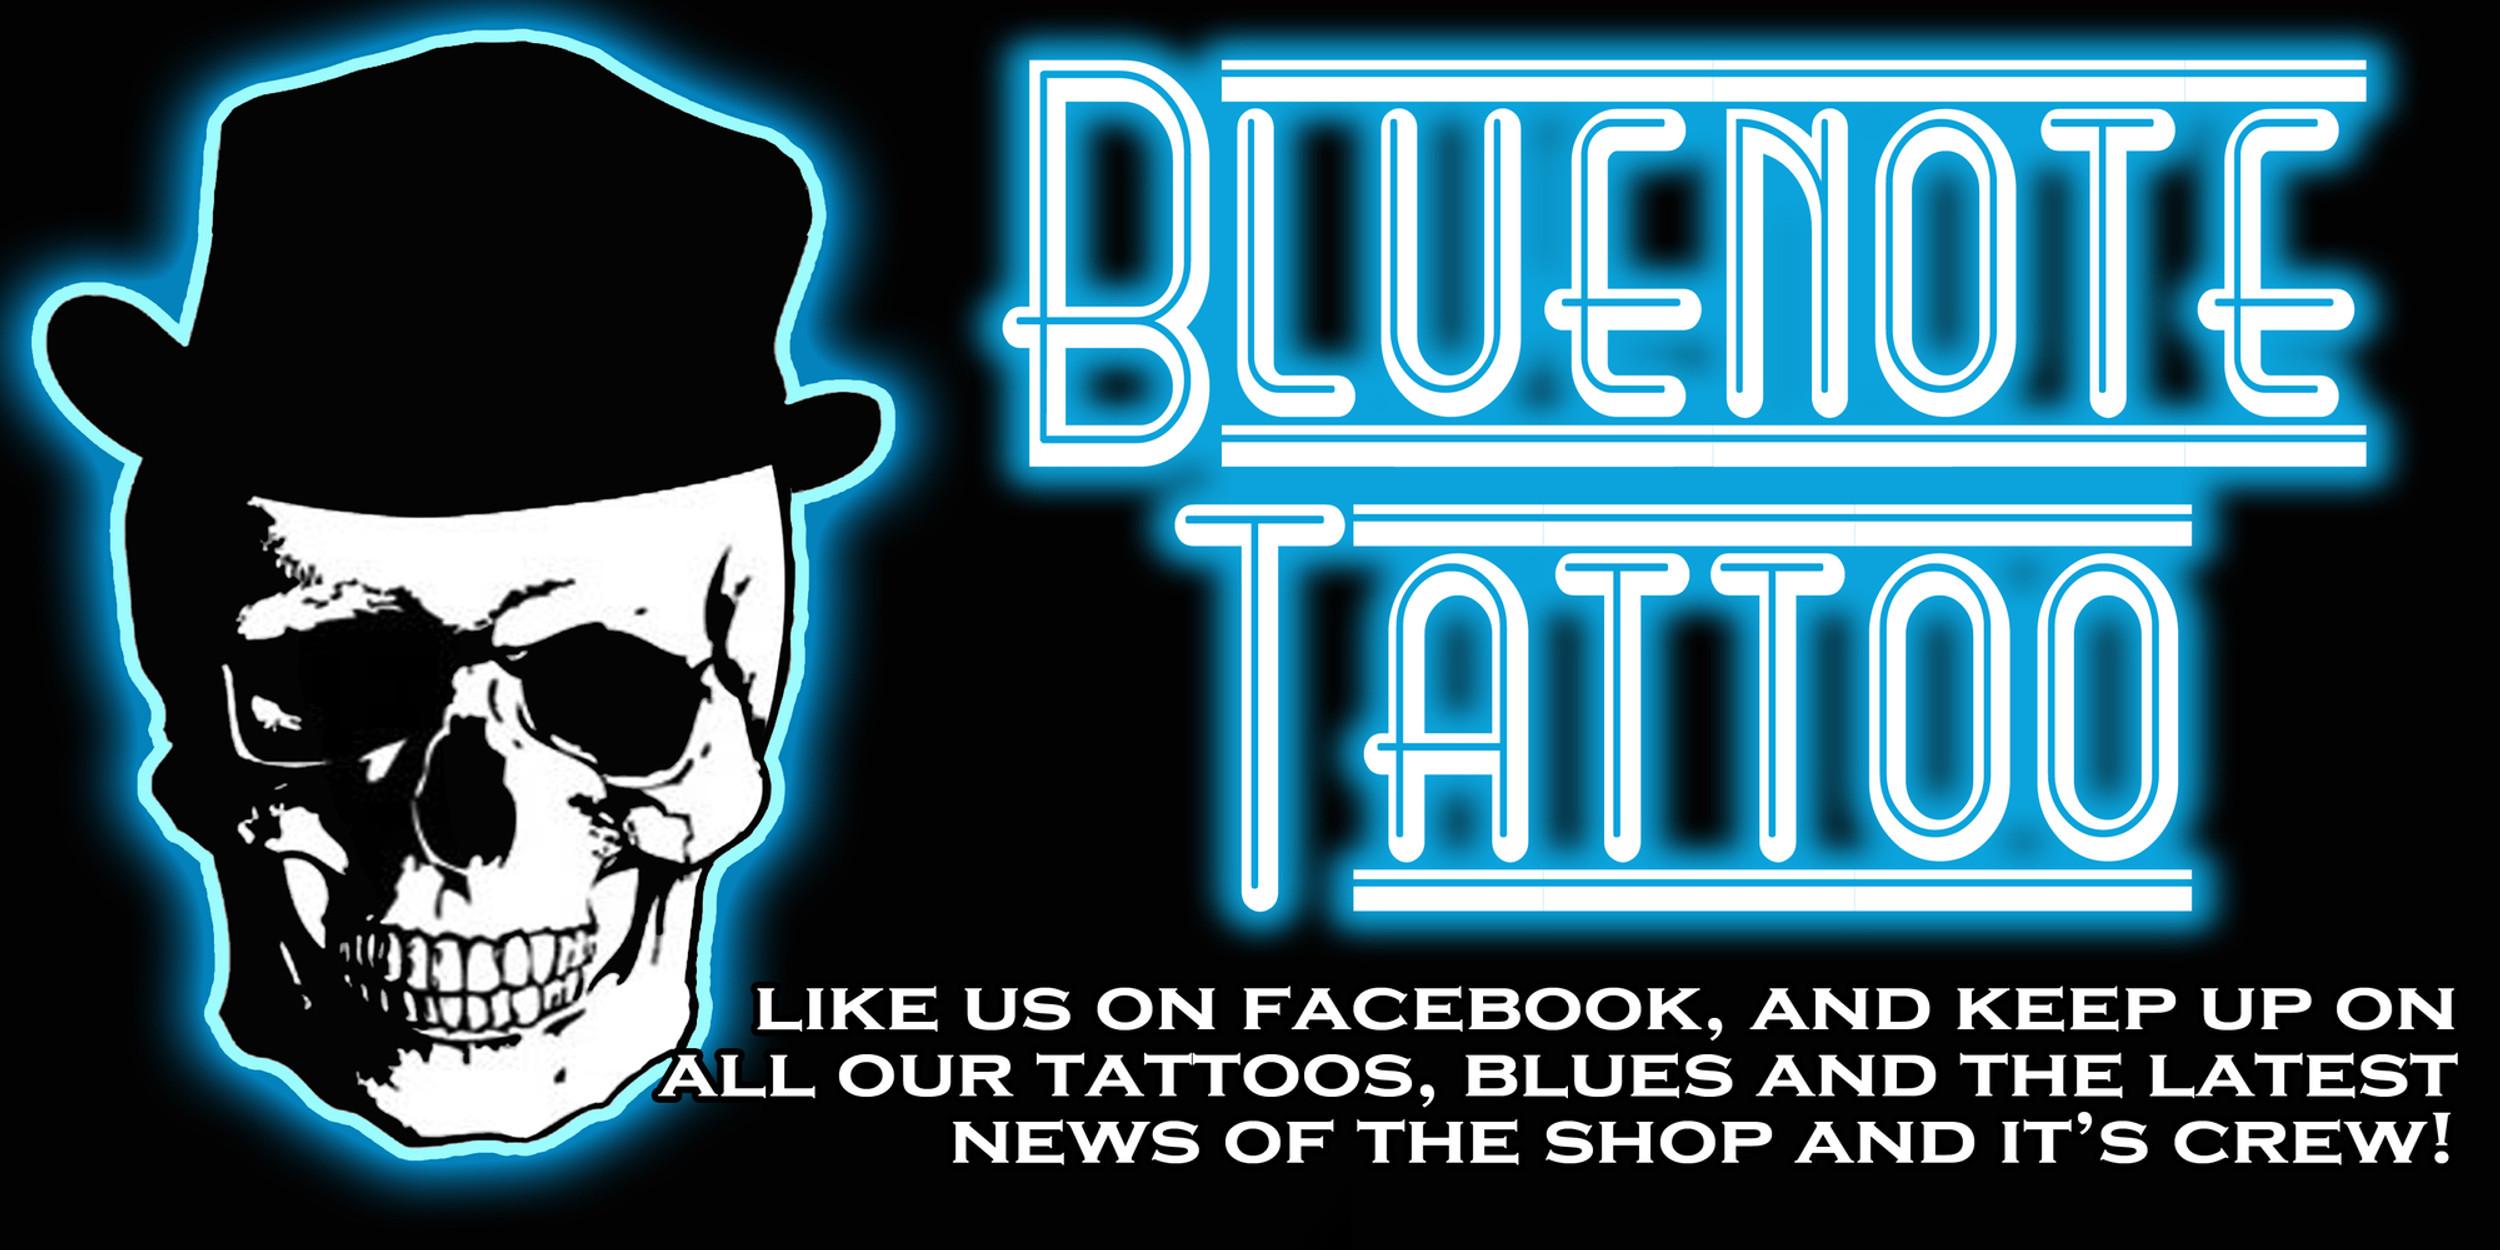 Bluenote Tattoo- Home of the best tattoo artists in Las Vegas